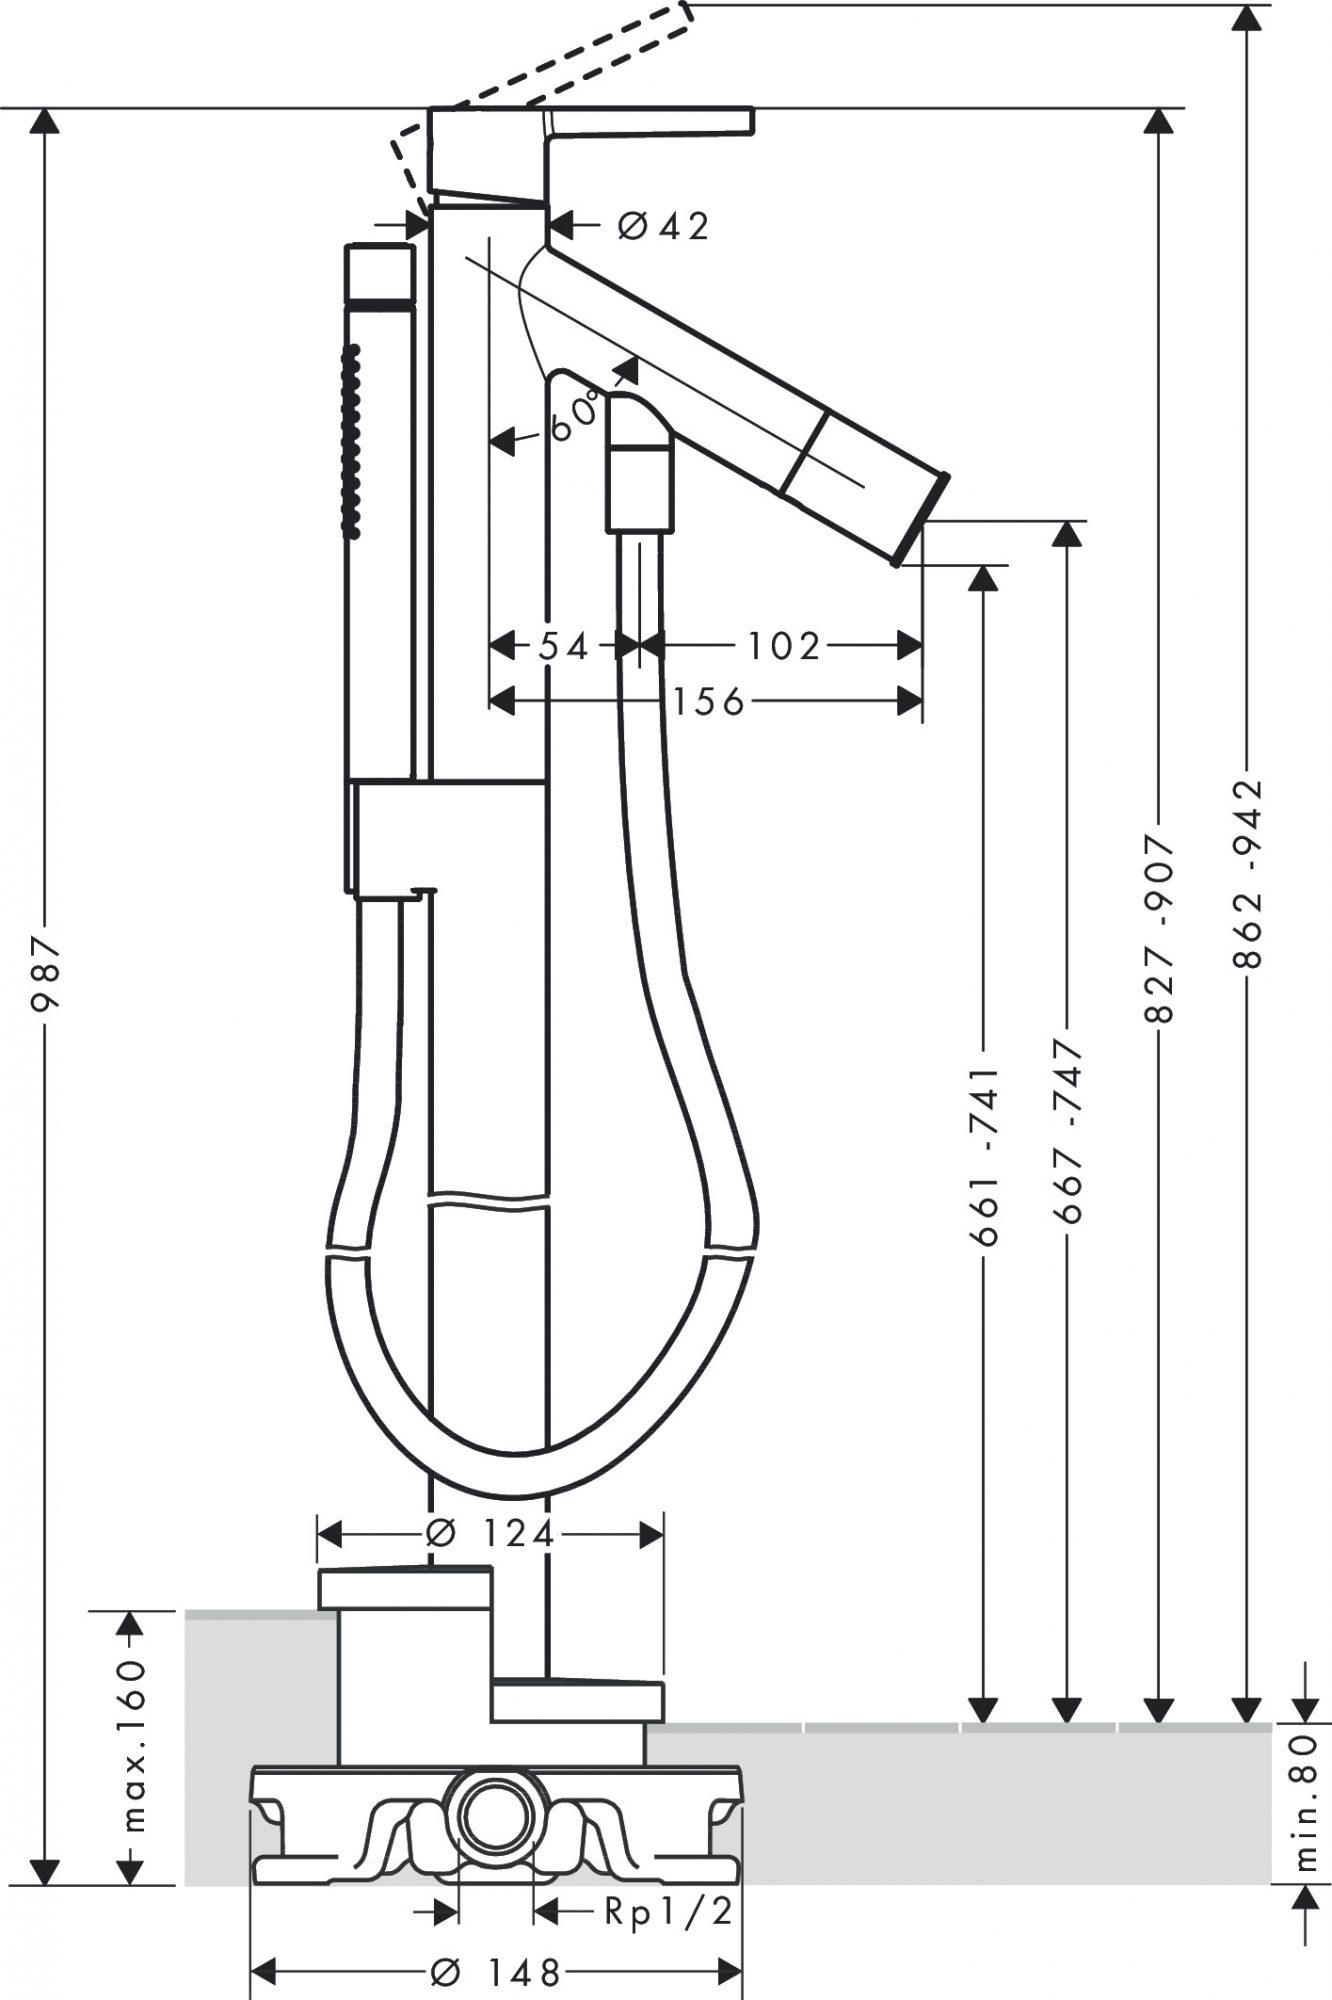 10455000 AXOR Starck Floor standing single lever bath mixer with matching AXOR Starck handle